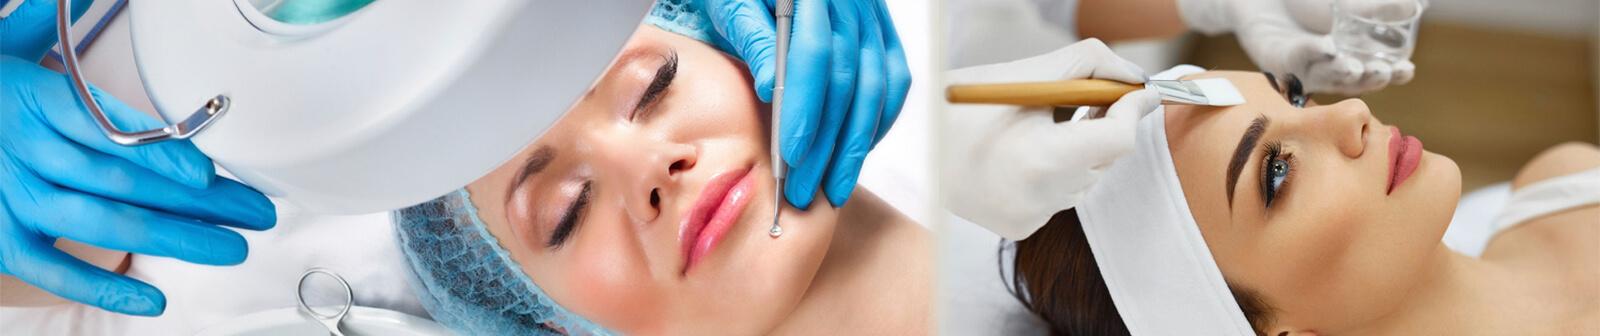 Cosmetics Services